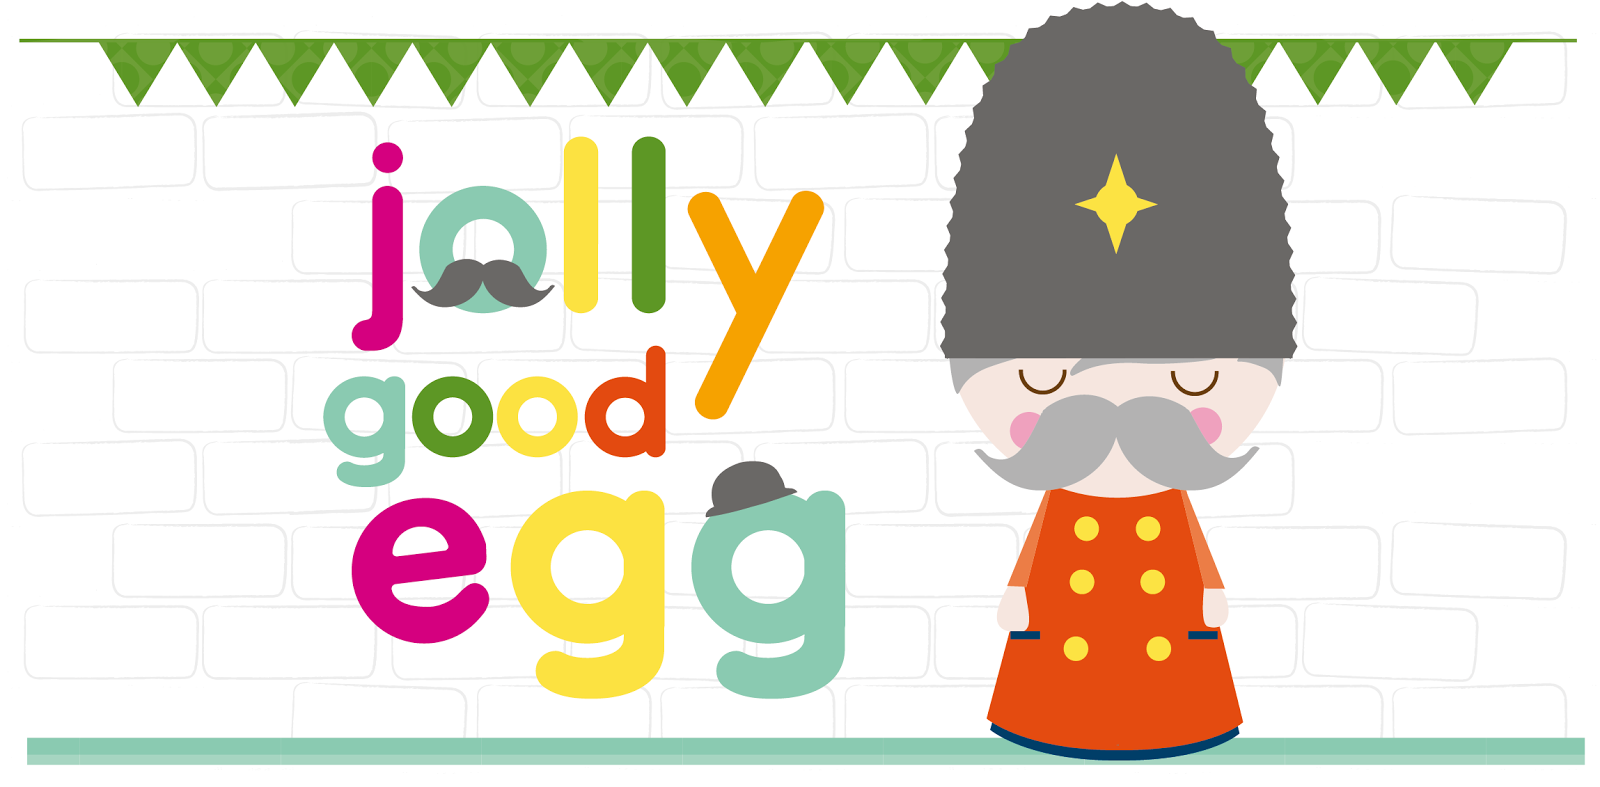 ruth ashton_a jolly good egg